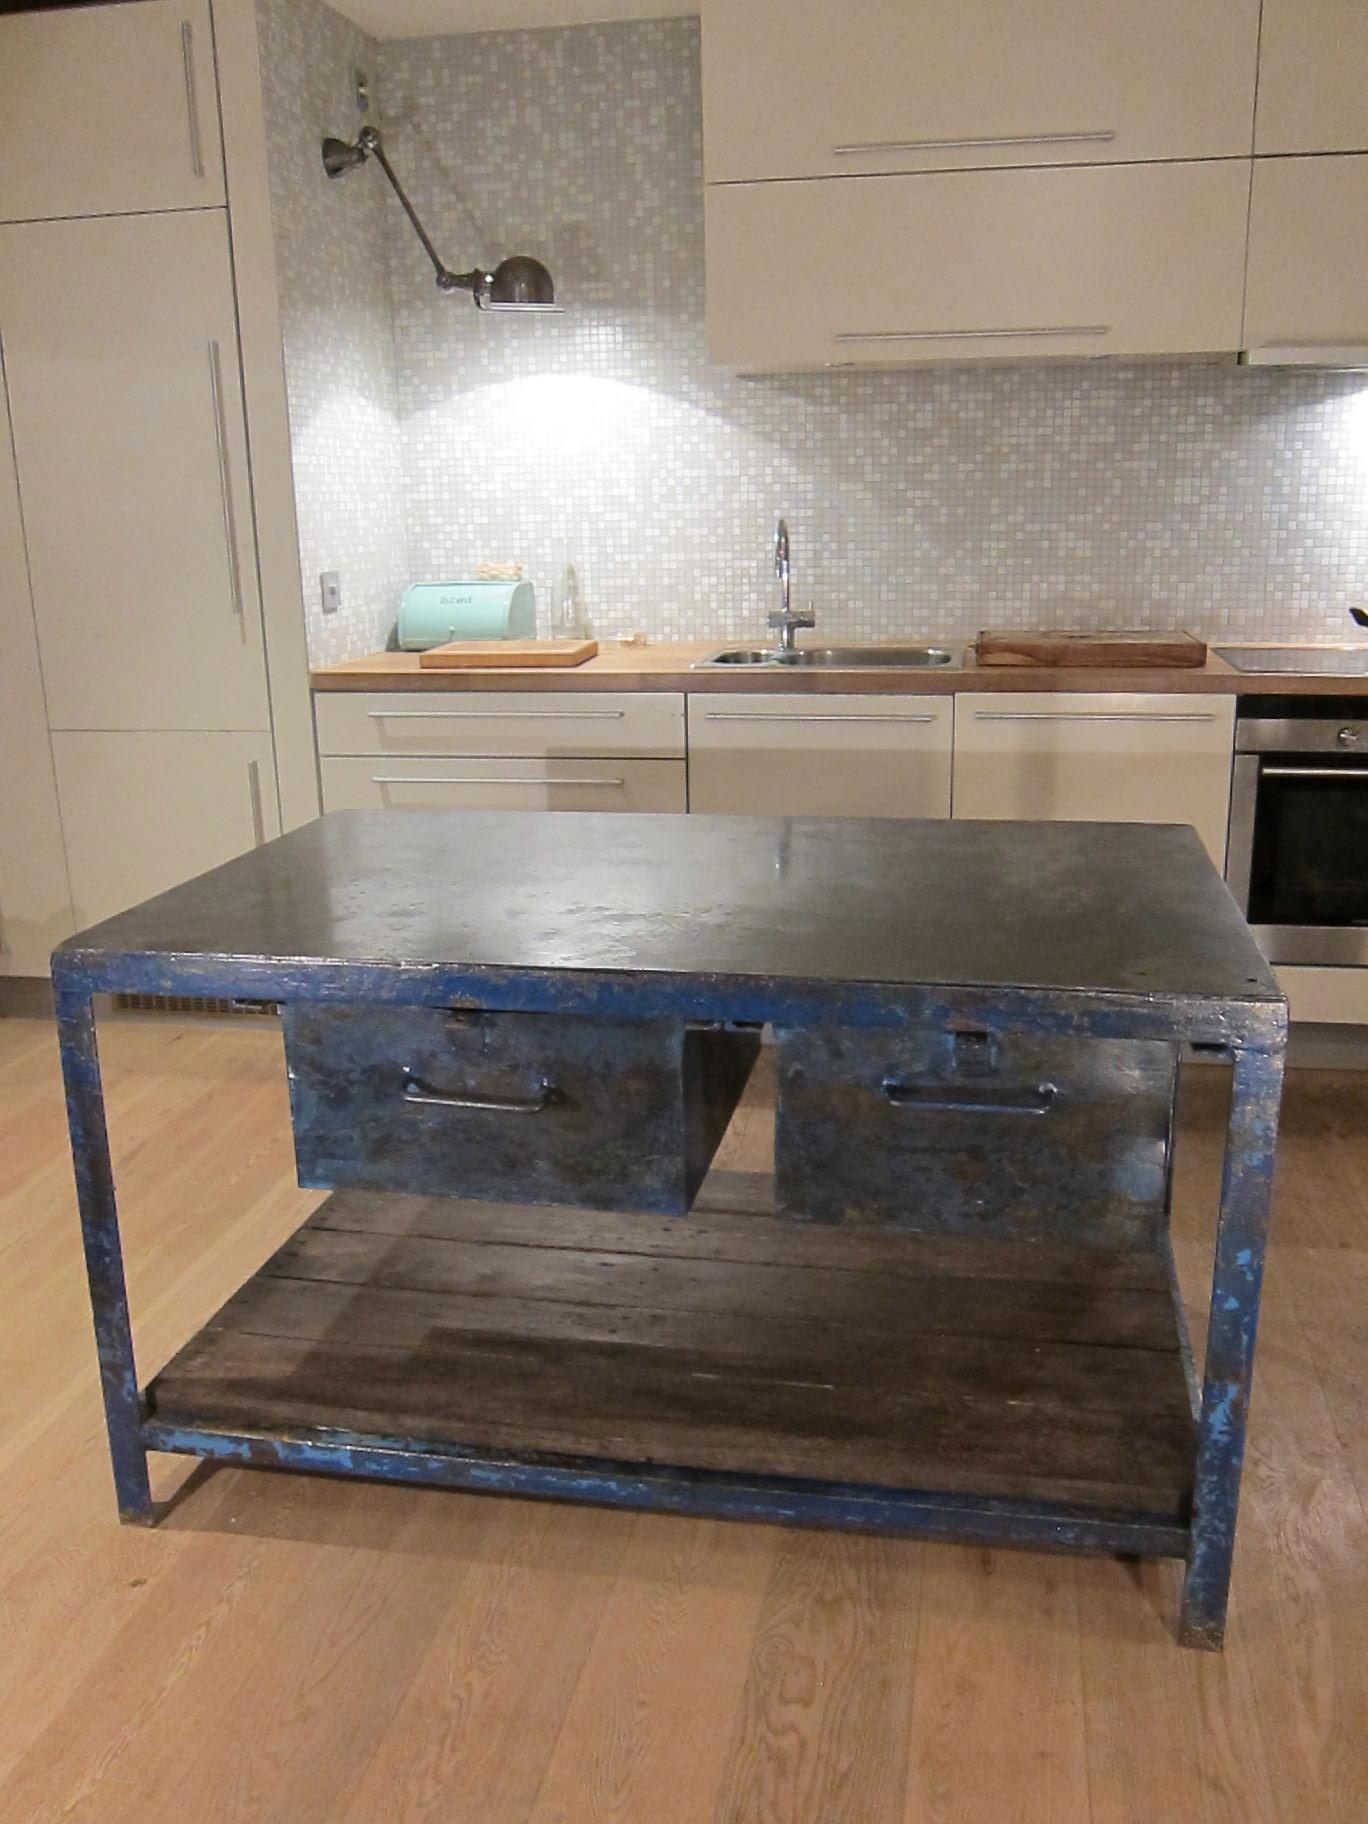 Stort bl?tt/gr?tt industrielt bord i metall, trehylle under, 2 store ...